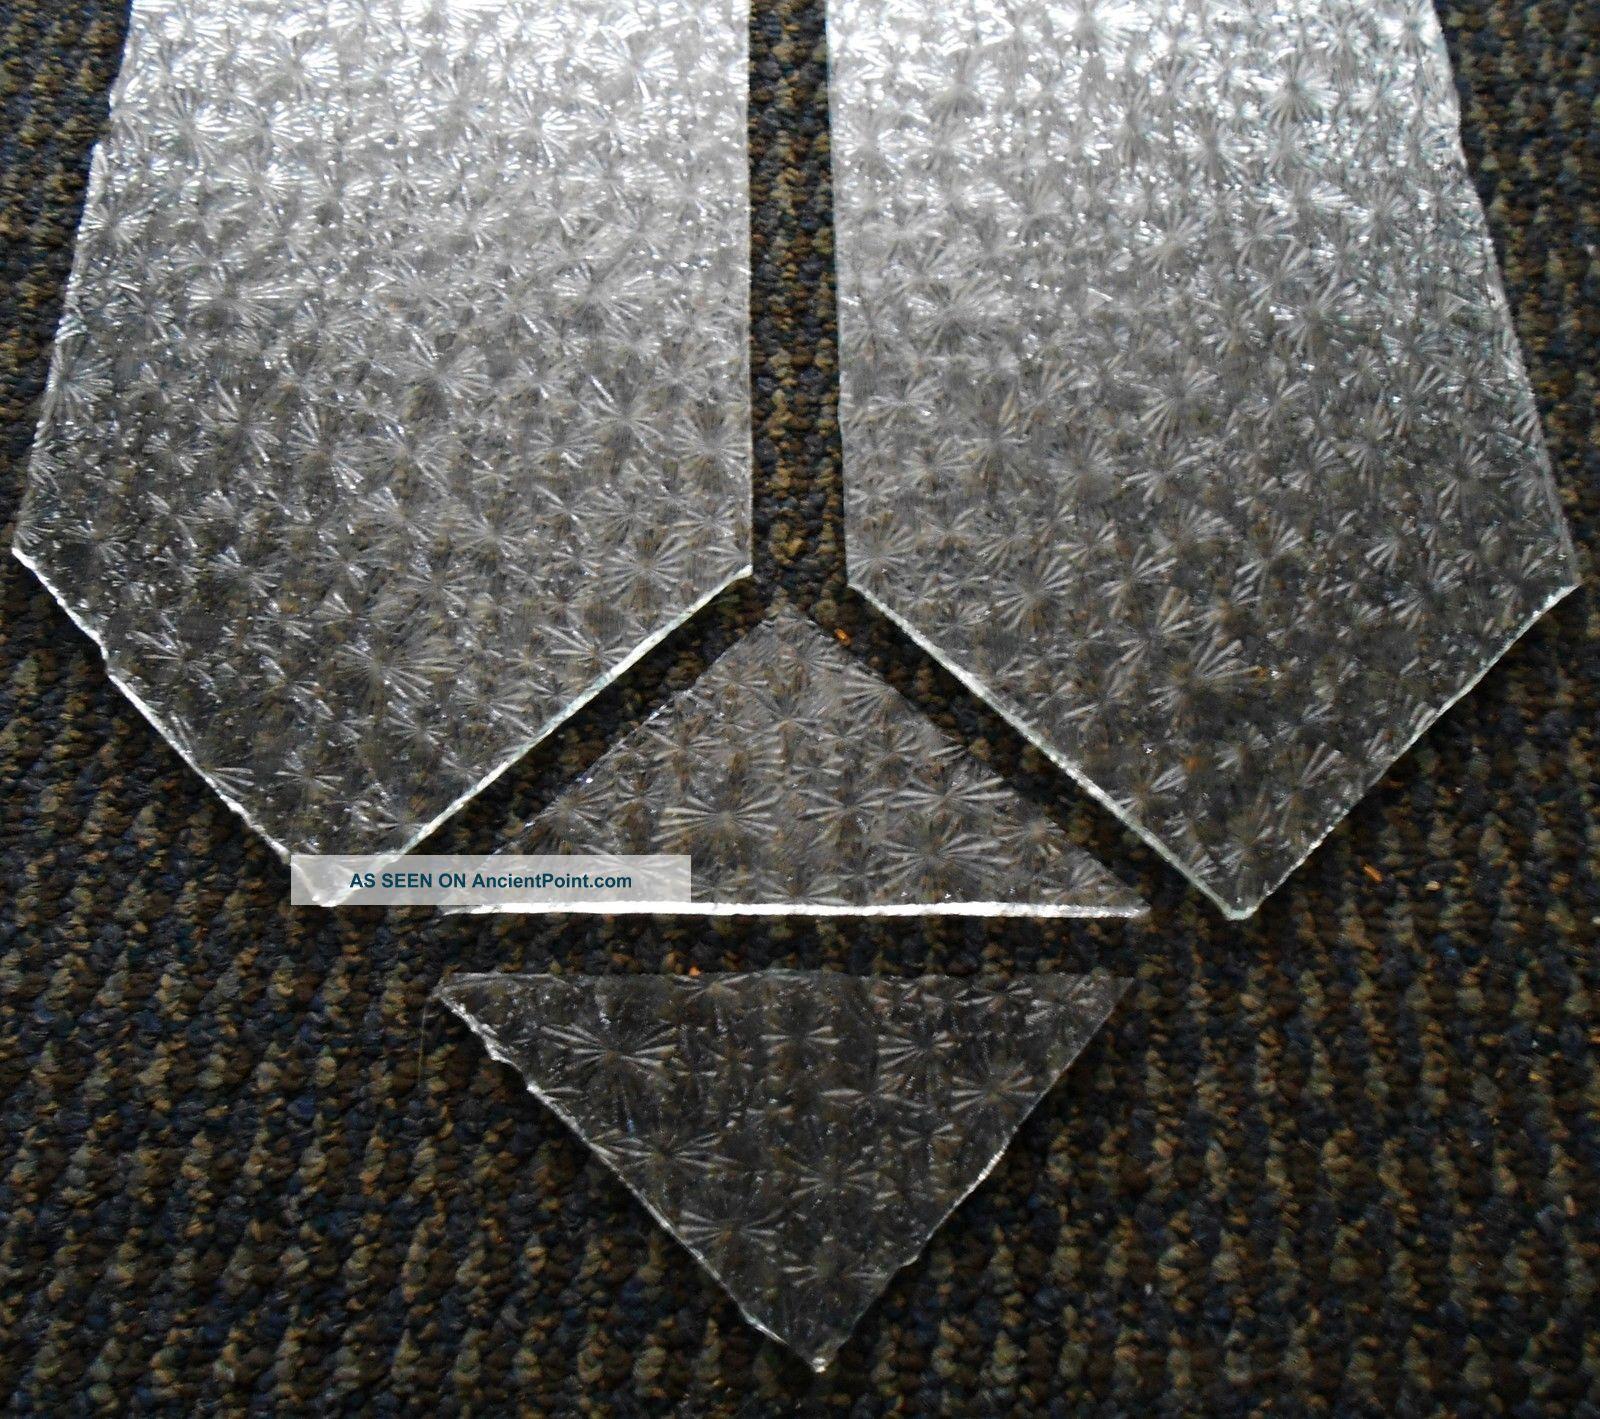 4 Vintage Clear Glass Sheets Antique Mosaic Tiles Snowflakes Pattern Textured 1900 1940 Photo Mosaic Tiles Snowflake Pattern Textures Patterns